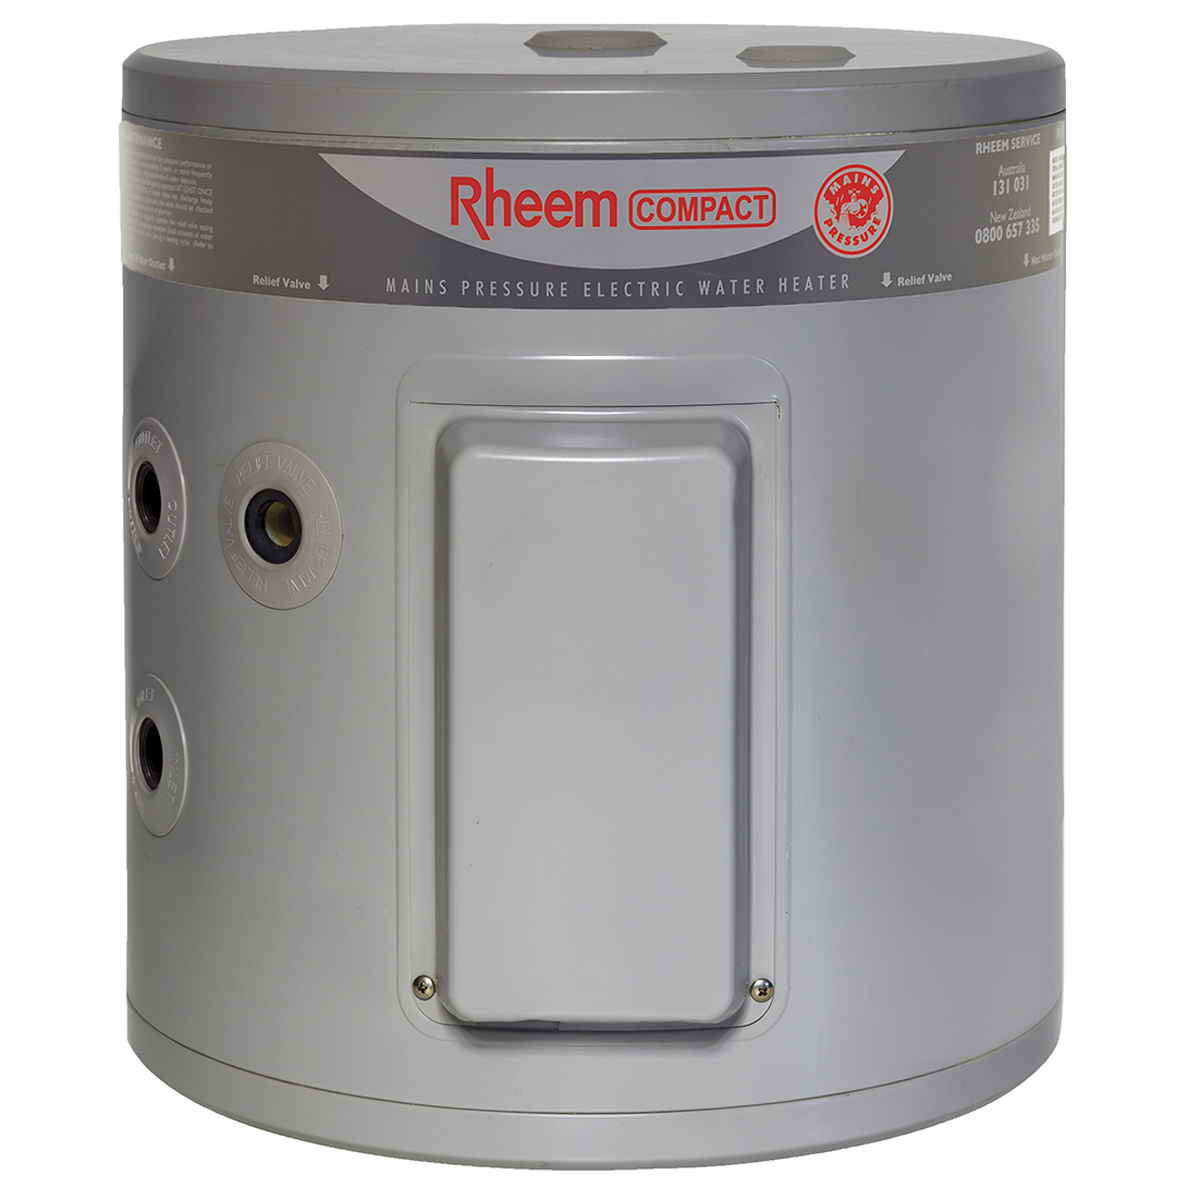 Rheem Compact 25L or 47L Electric Water Heater